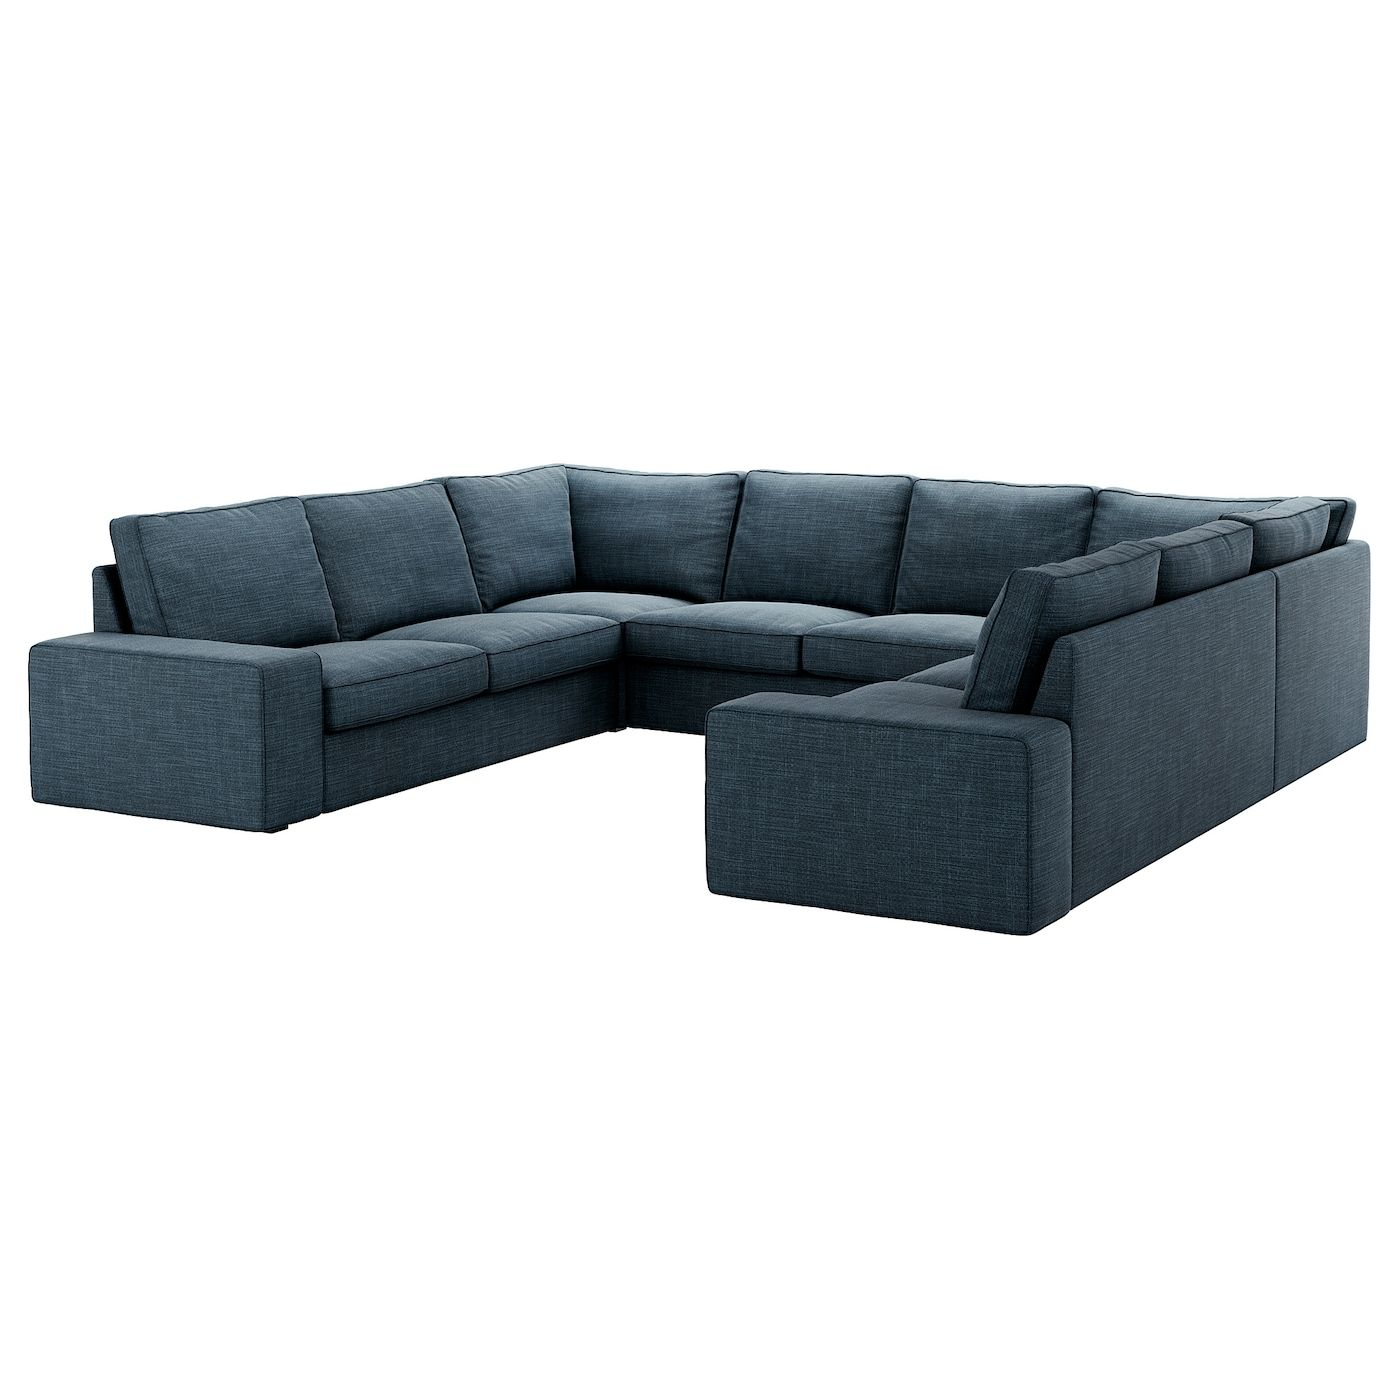 Kivik Sofa U Form 6 Sitzig Hillared 8 Platze Dunkelblau Ikea Osterreich In 2020 Blue Sectional U Shaped Sofa Ikea Sofa